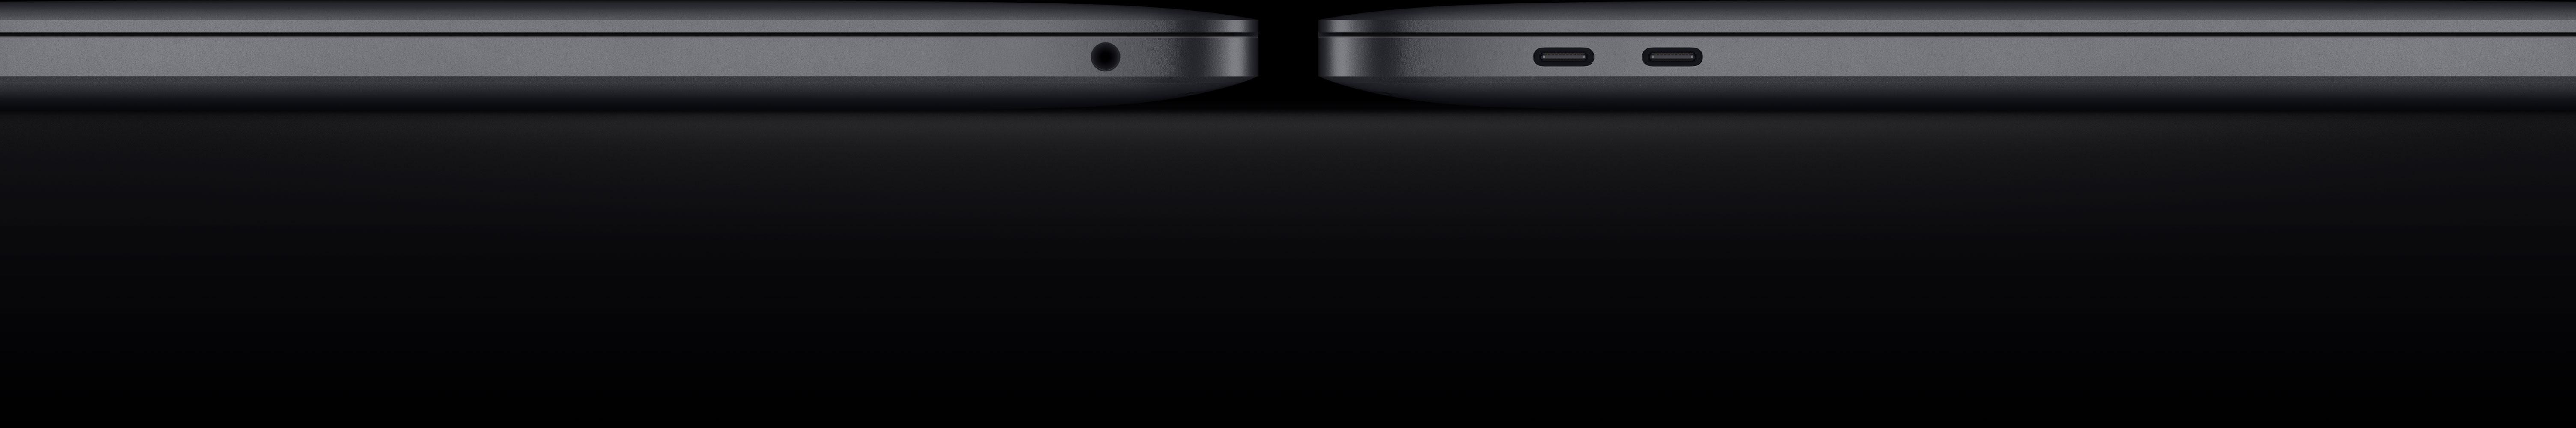 Macbook Pro Connectivity